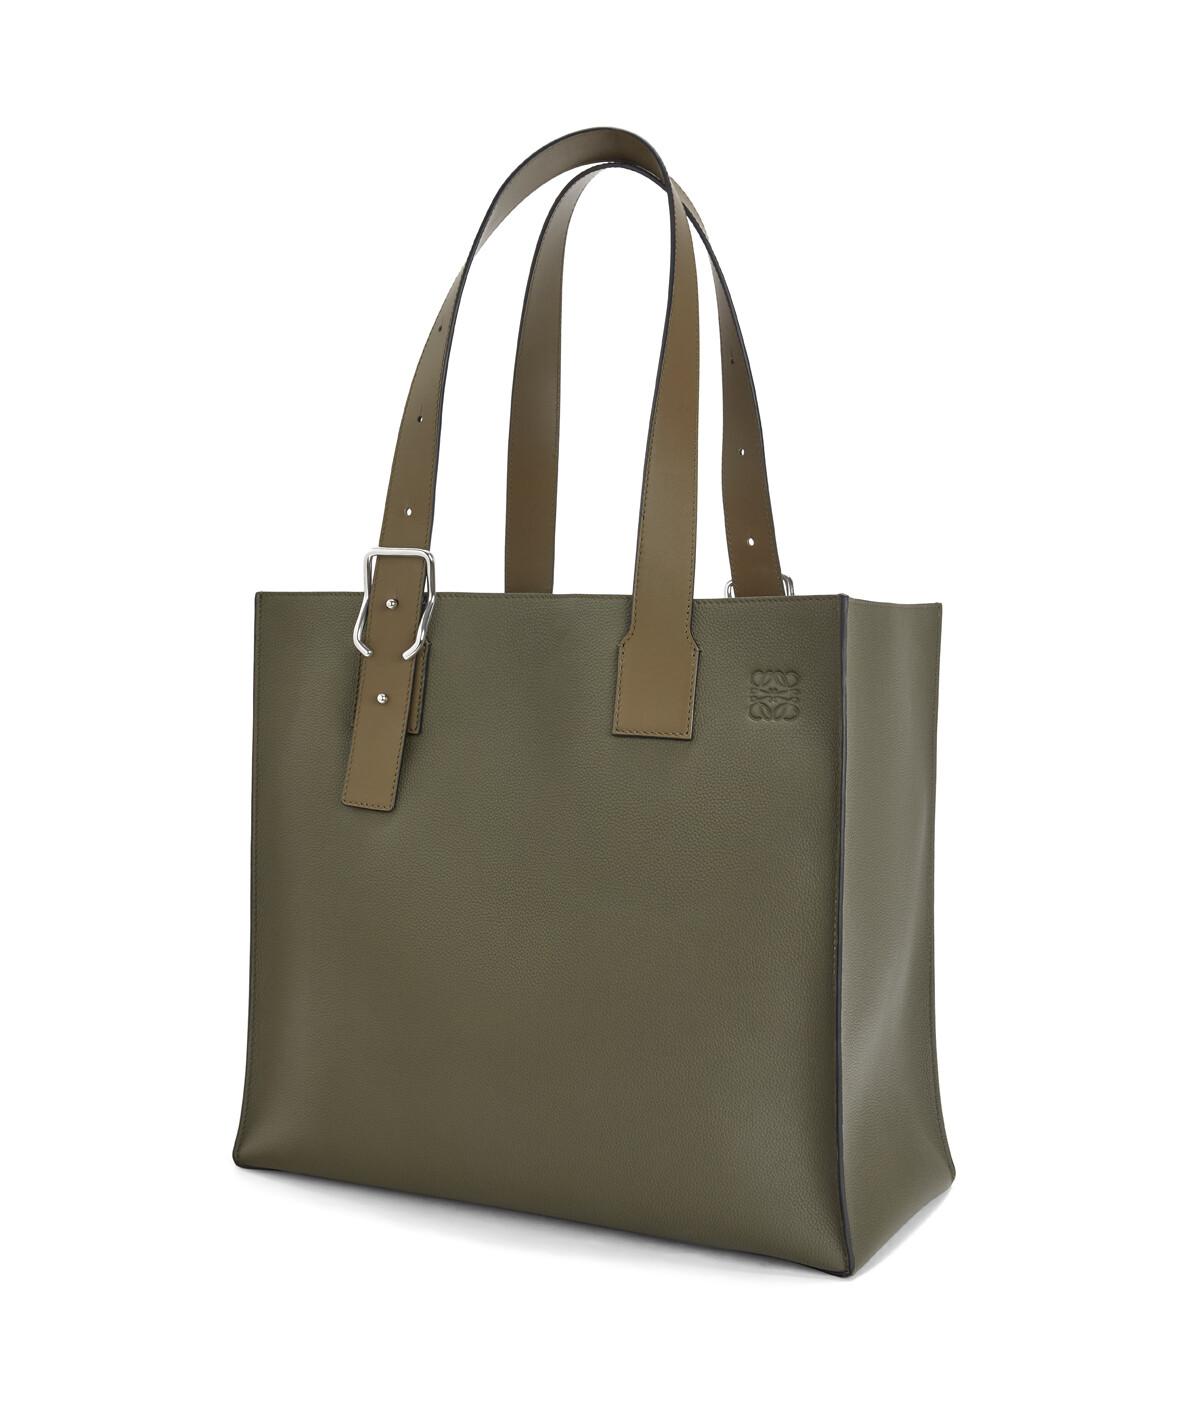 LOEWE Buckle Tote Bag Khaki Green front